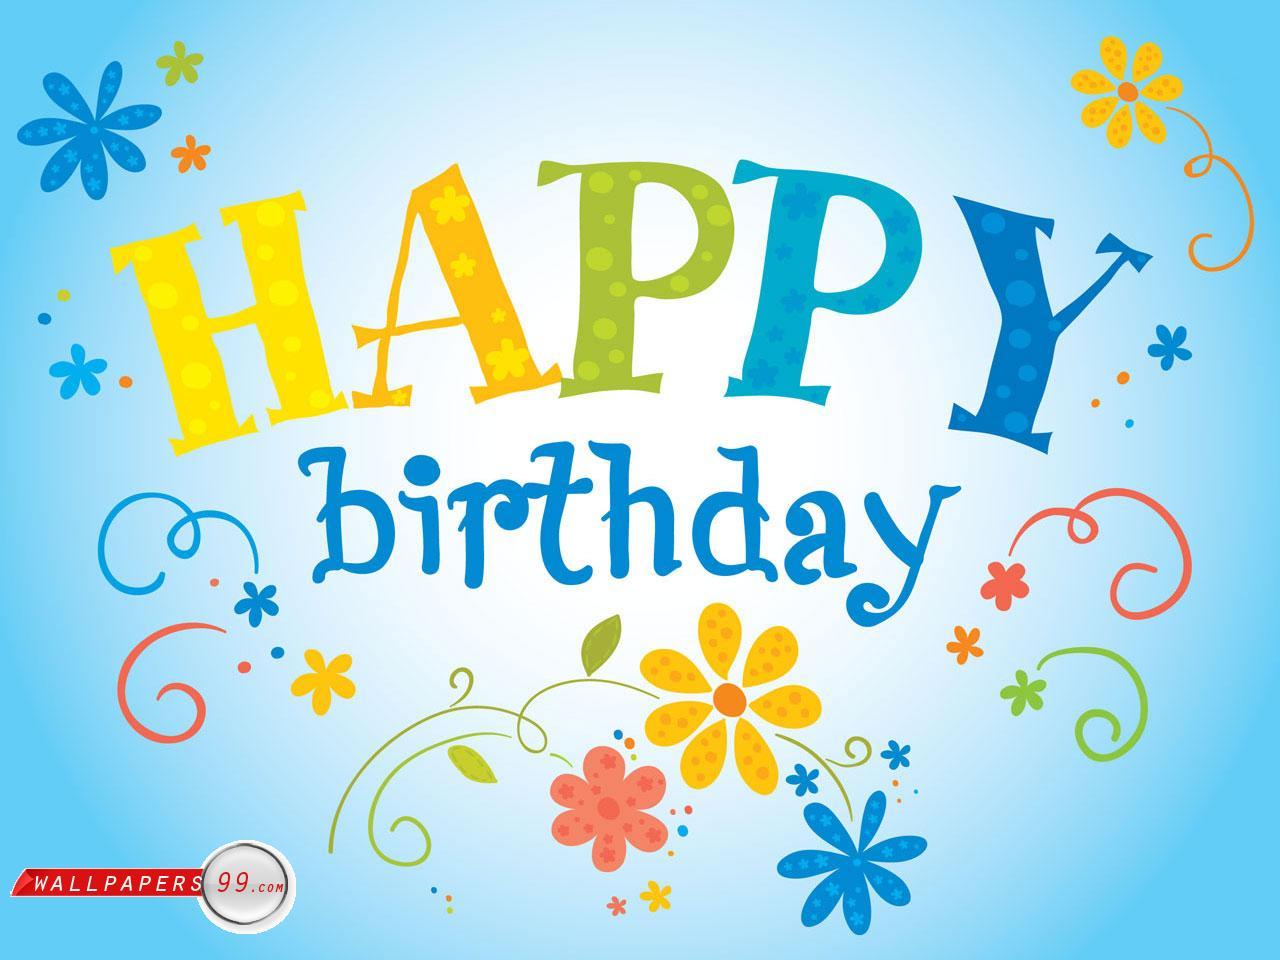 Happy birthday wallpaper hd pixelstalk happy birthday song free happy birthday wallpaper hd pixelstalk happy birthday song free download free large images birthday 1280x960 kristyandbryce Images